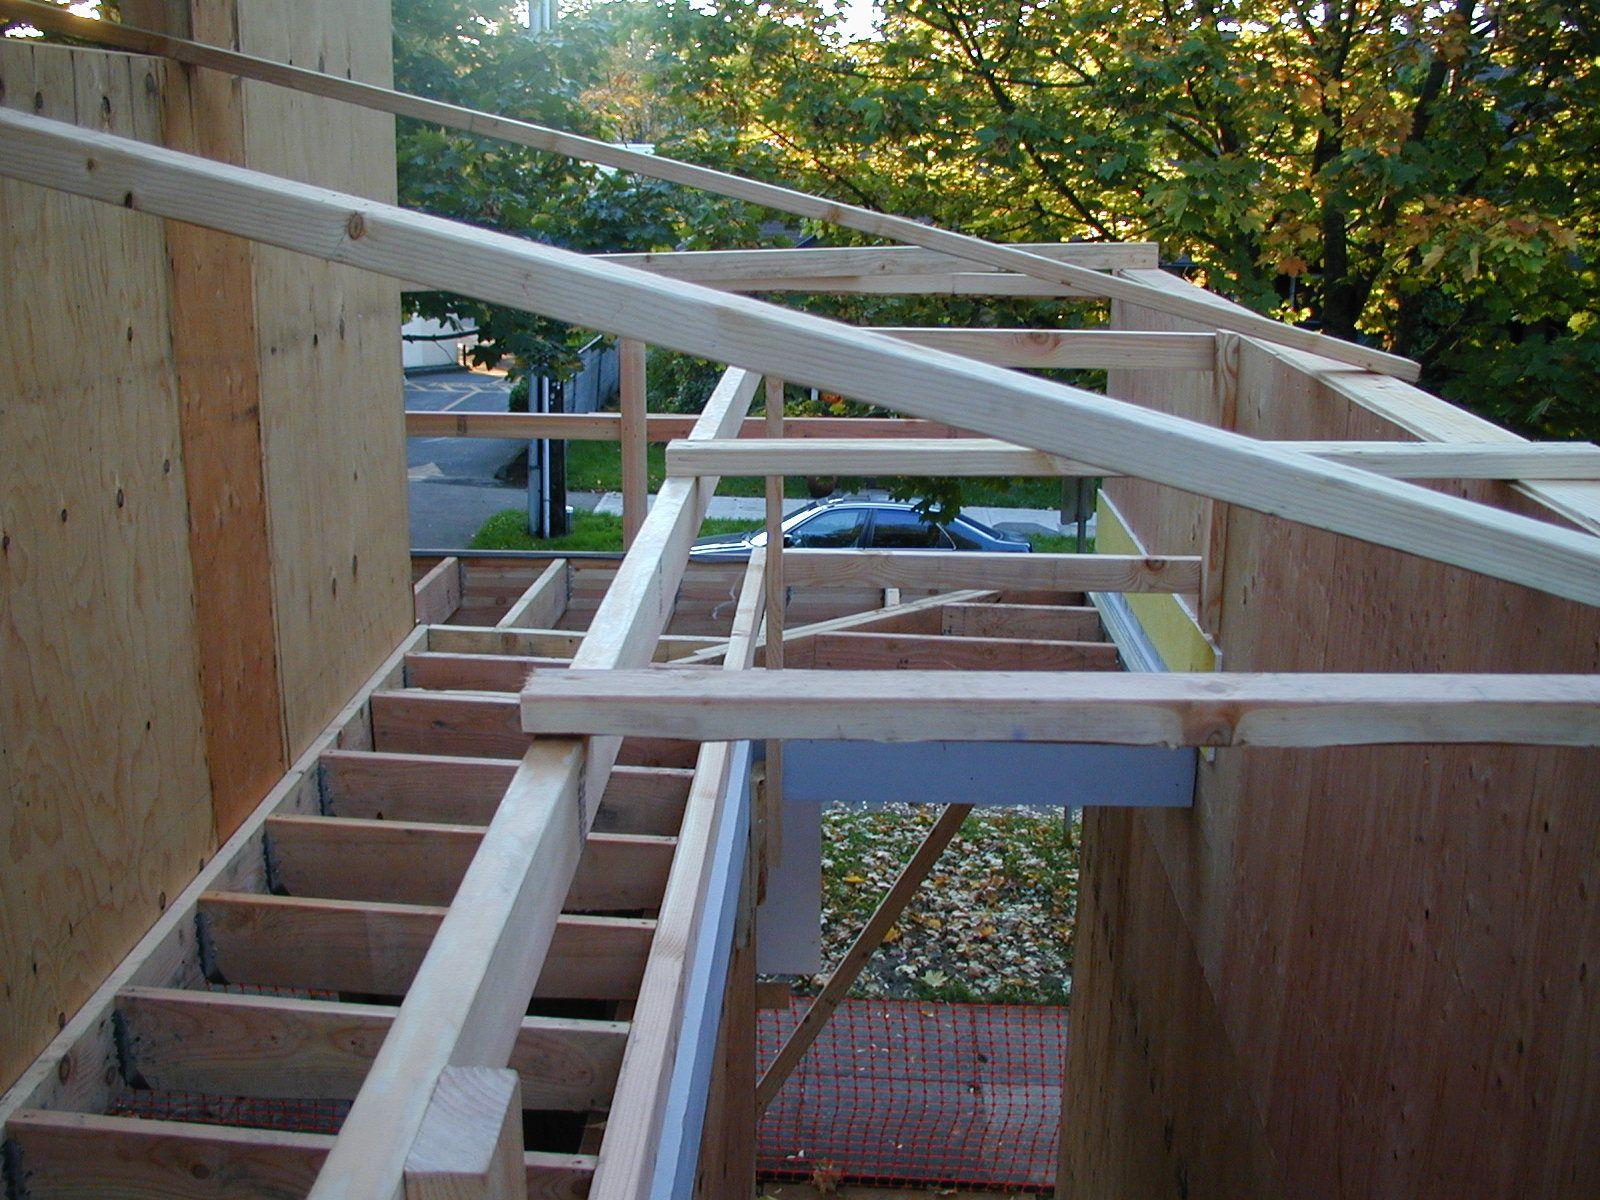 2003 Q4 Duplex Deck4.jpg